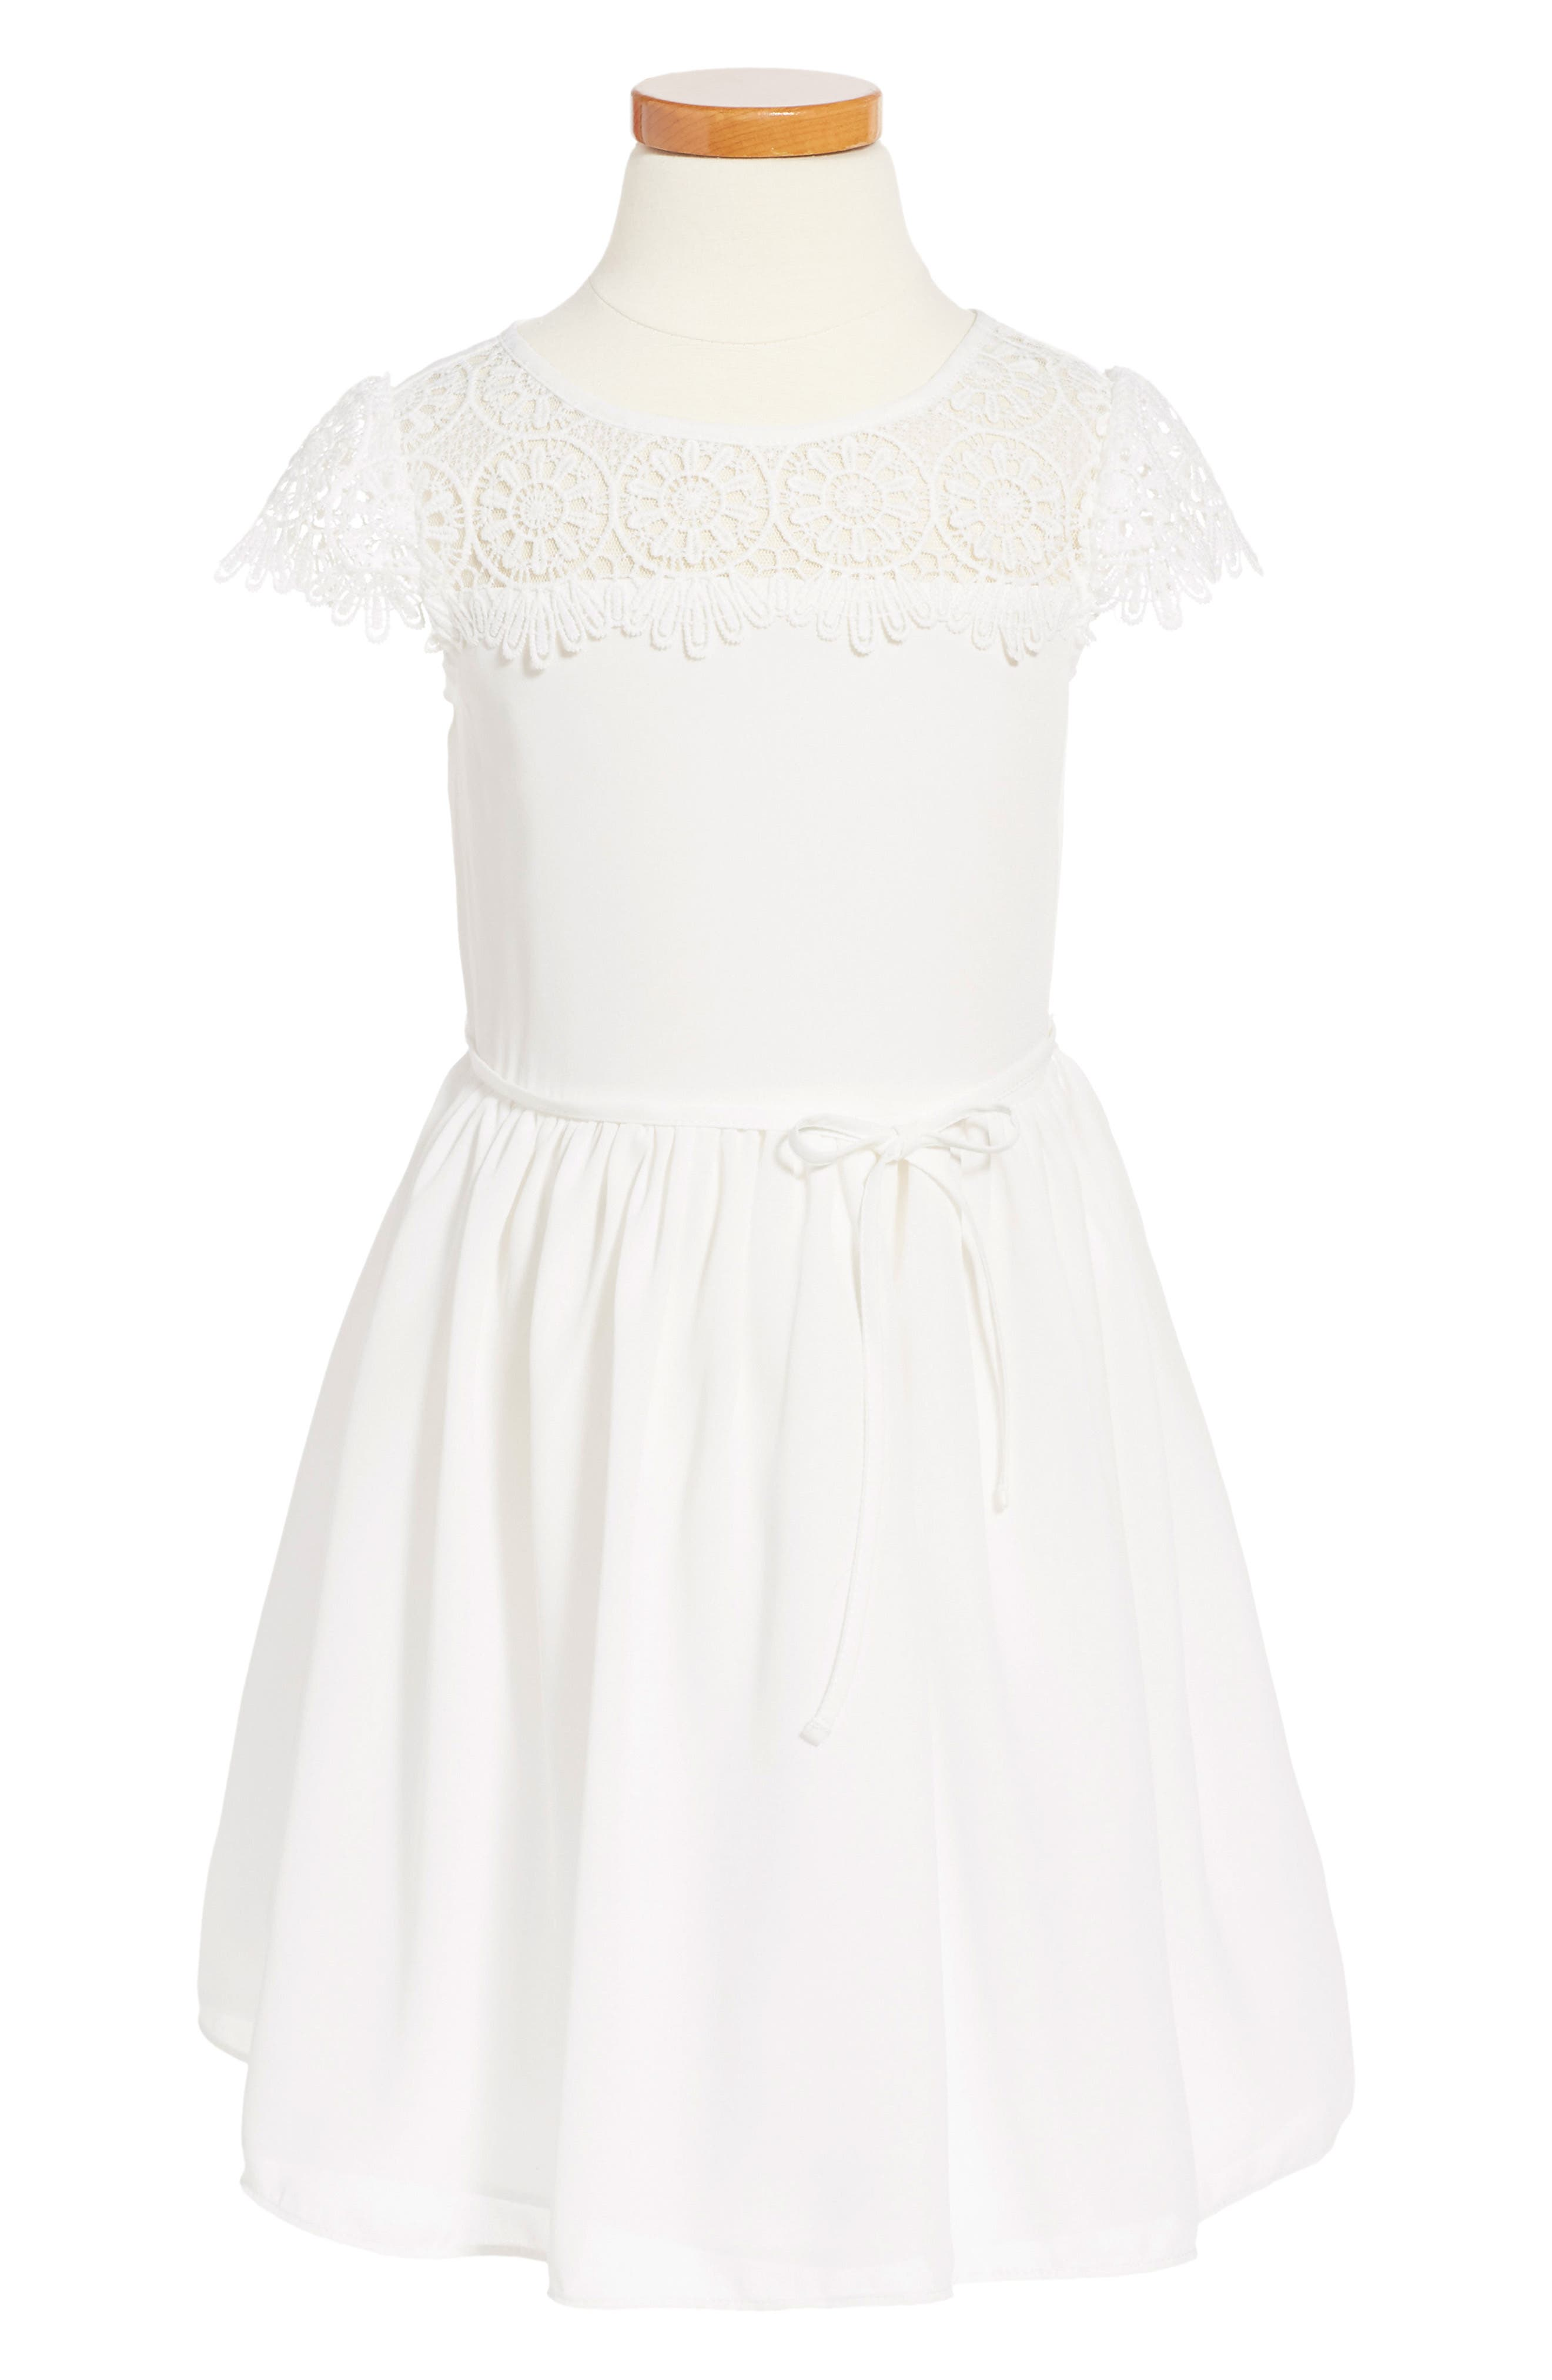 Little Angels Scalloped Crochet Yoke Party Dress (Toddler Girls & Little Girls)